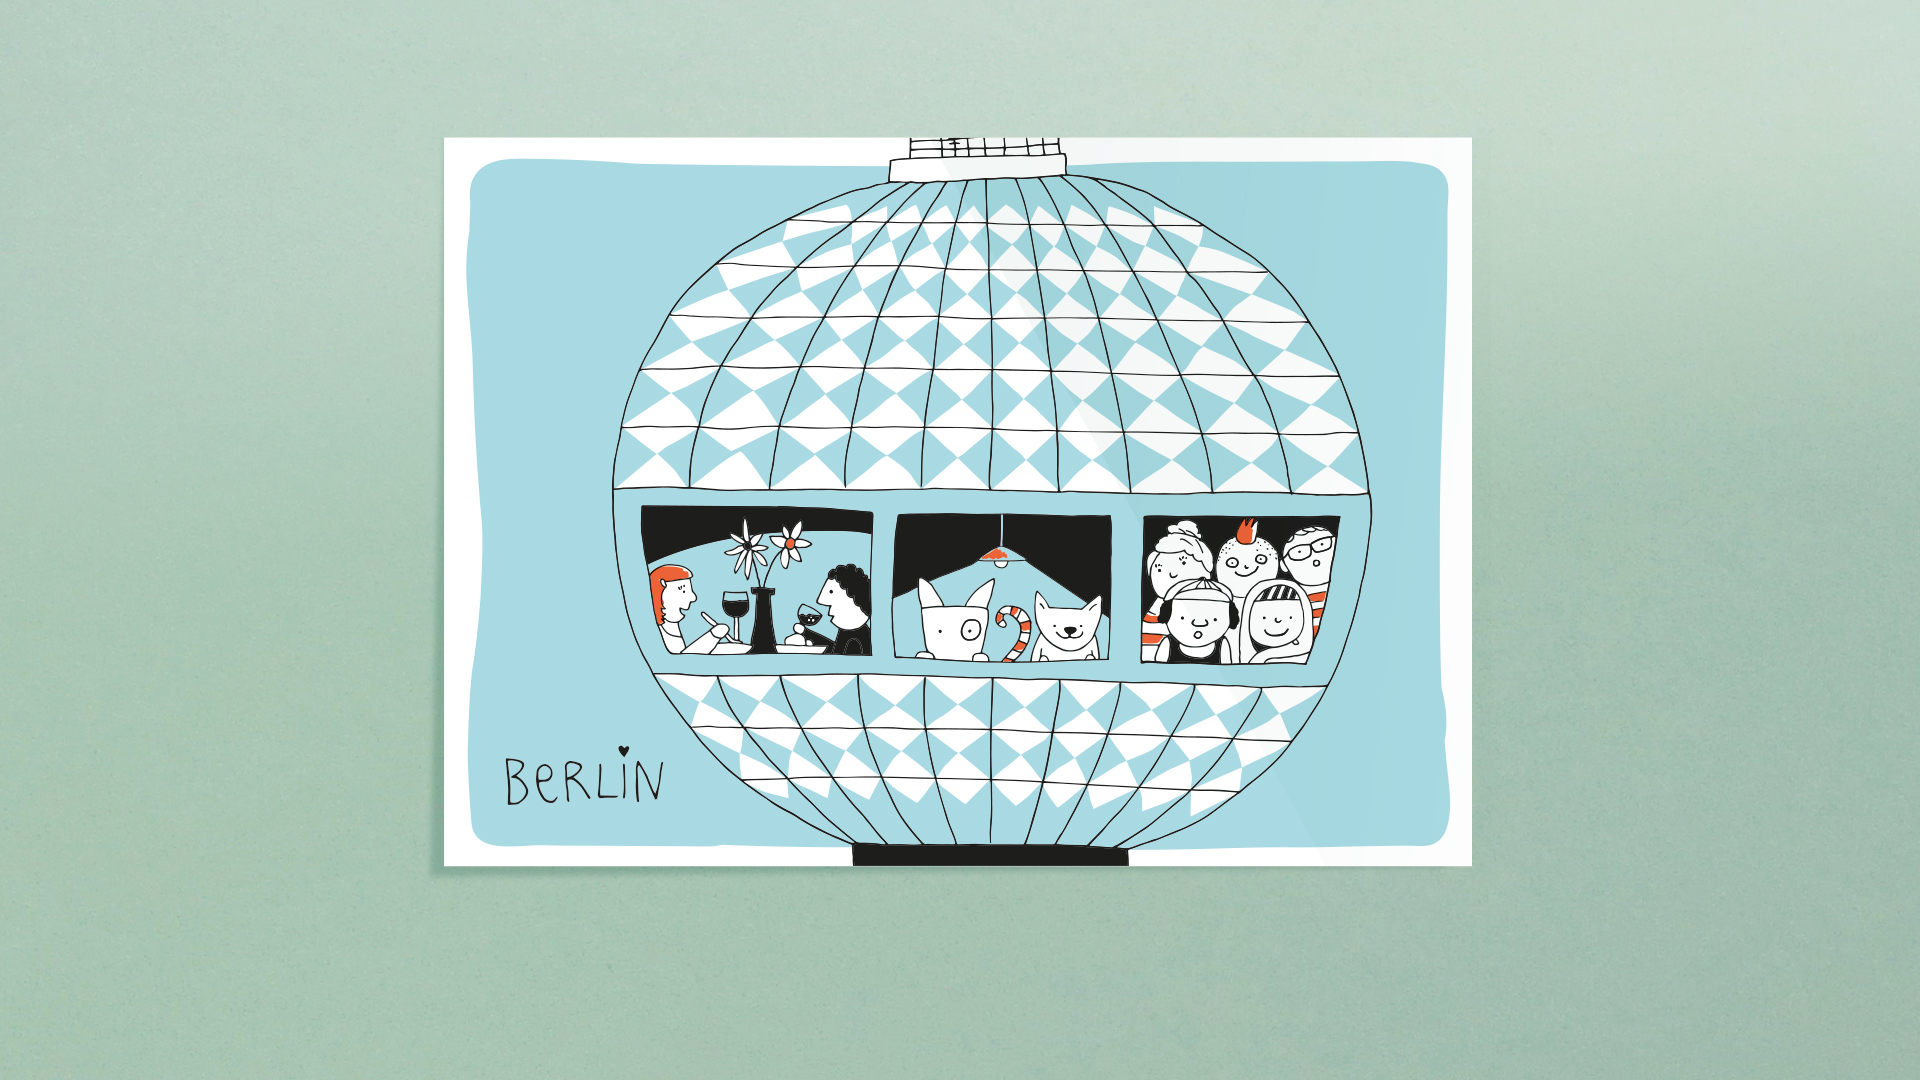 Berlin Postkarten - Fernsehturm